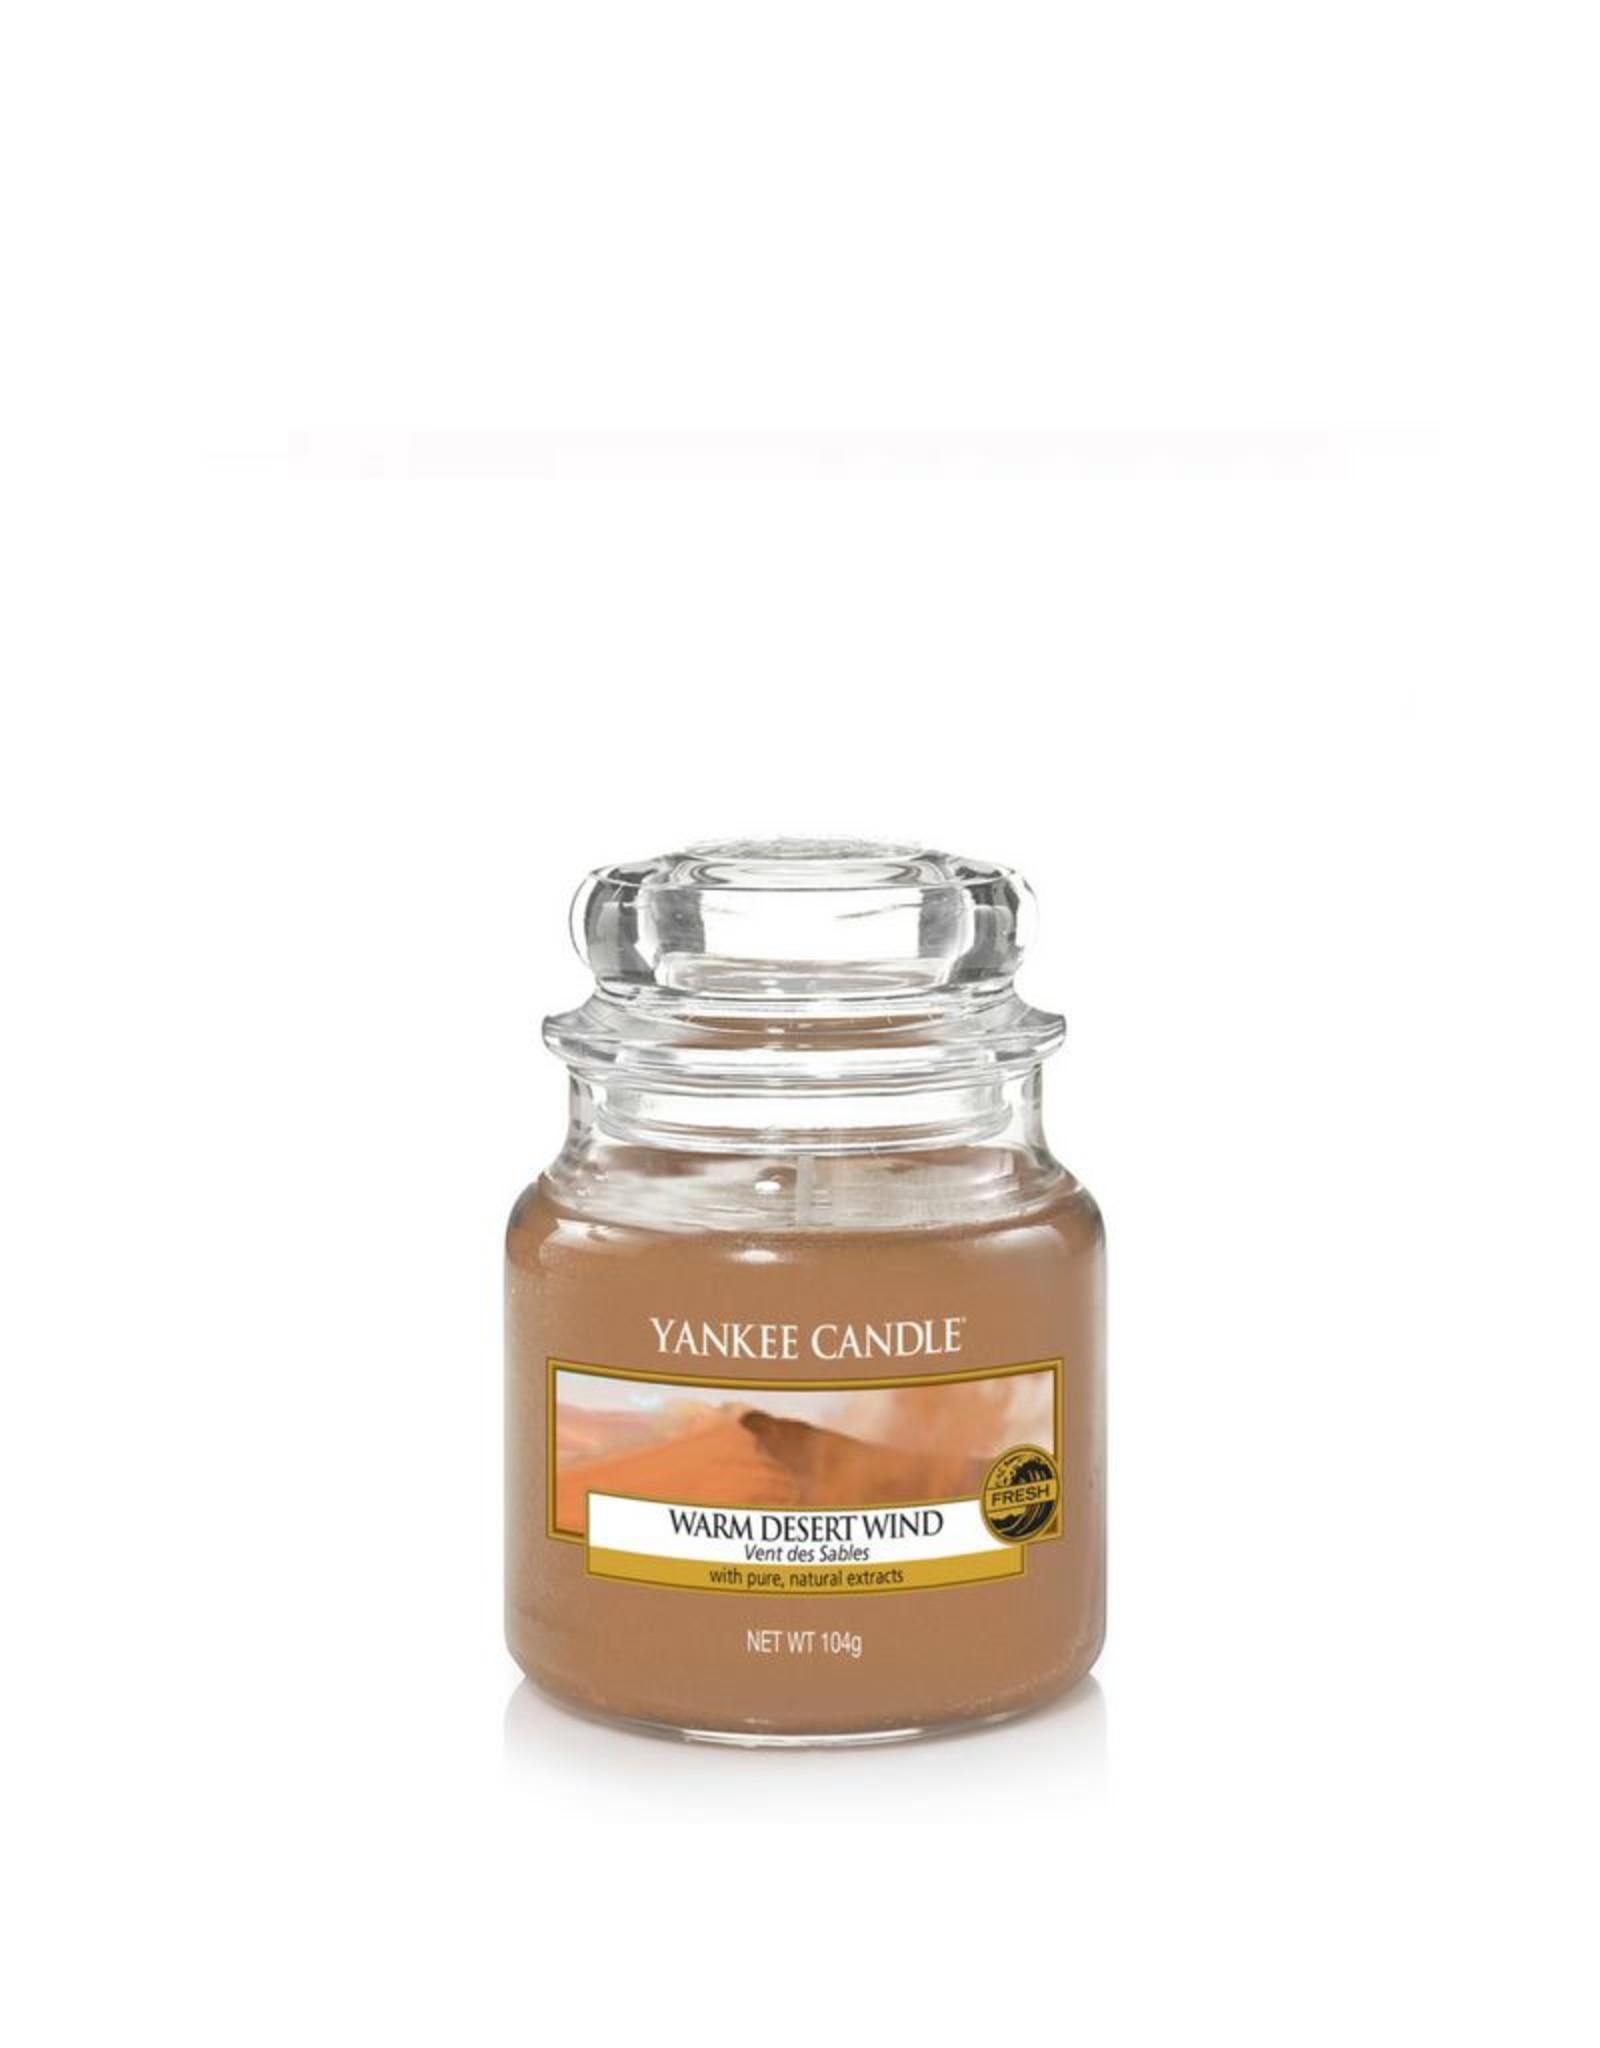 Yankee Candle Warm Desert Wind Small Jar